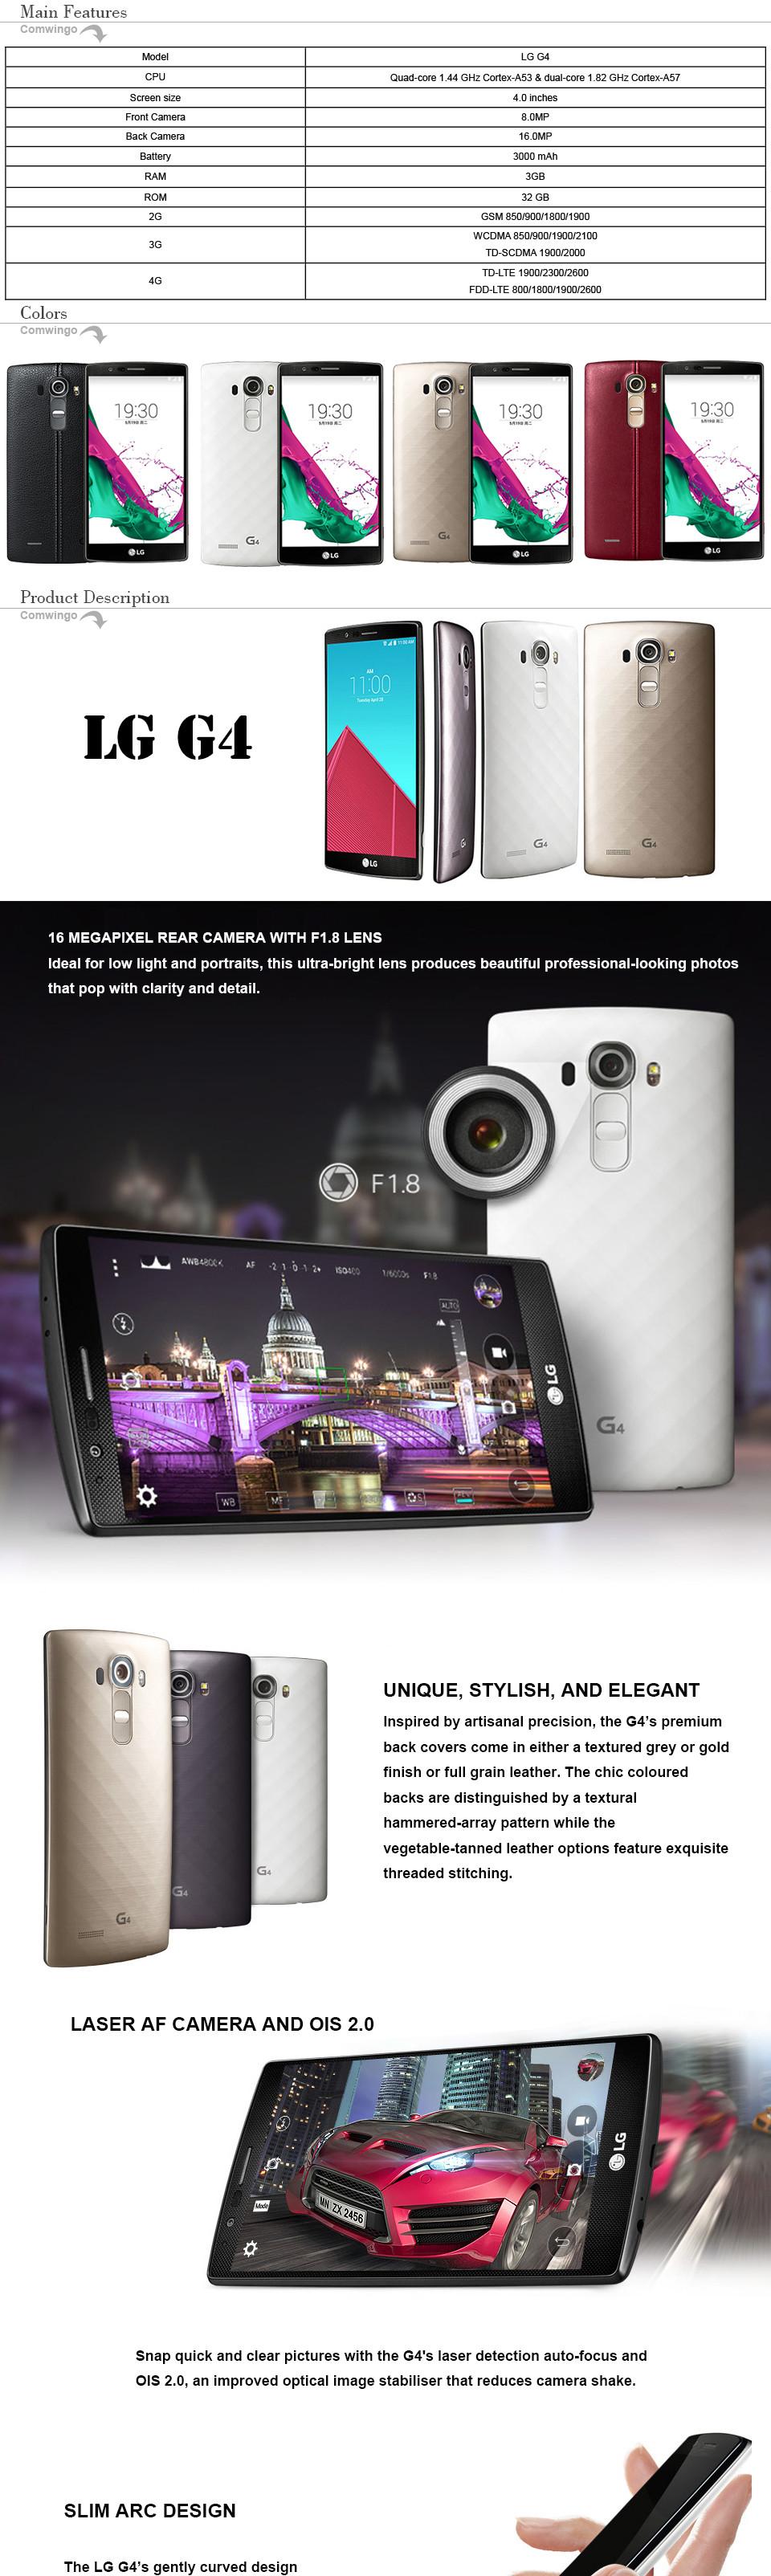 "Original Unlocked LG G4 H815T H811 H810 Quad core 4G LTE 16.0 MP Camera Android 32 GB ROM 5.5"" 1440 x 2560 pixels cellphone"